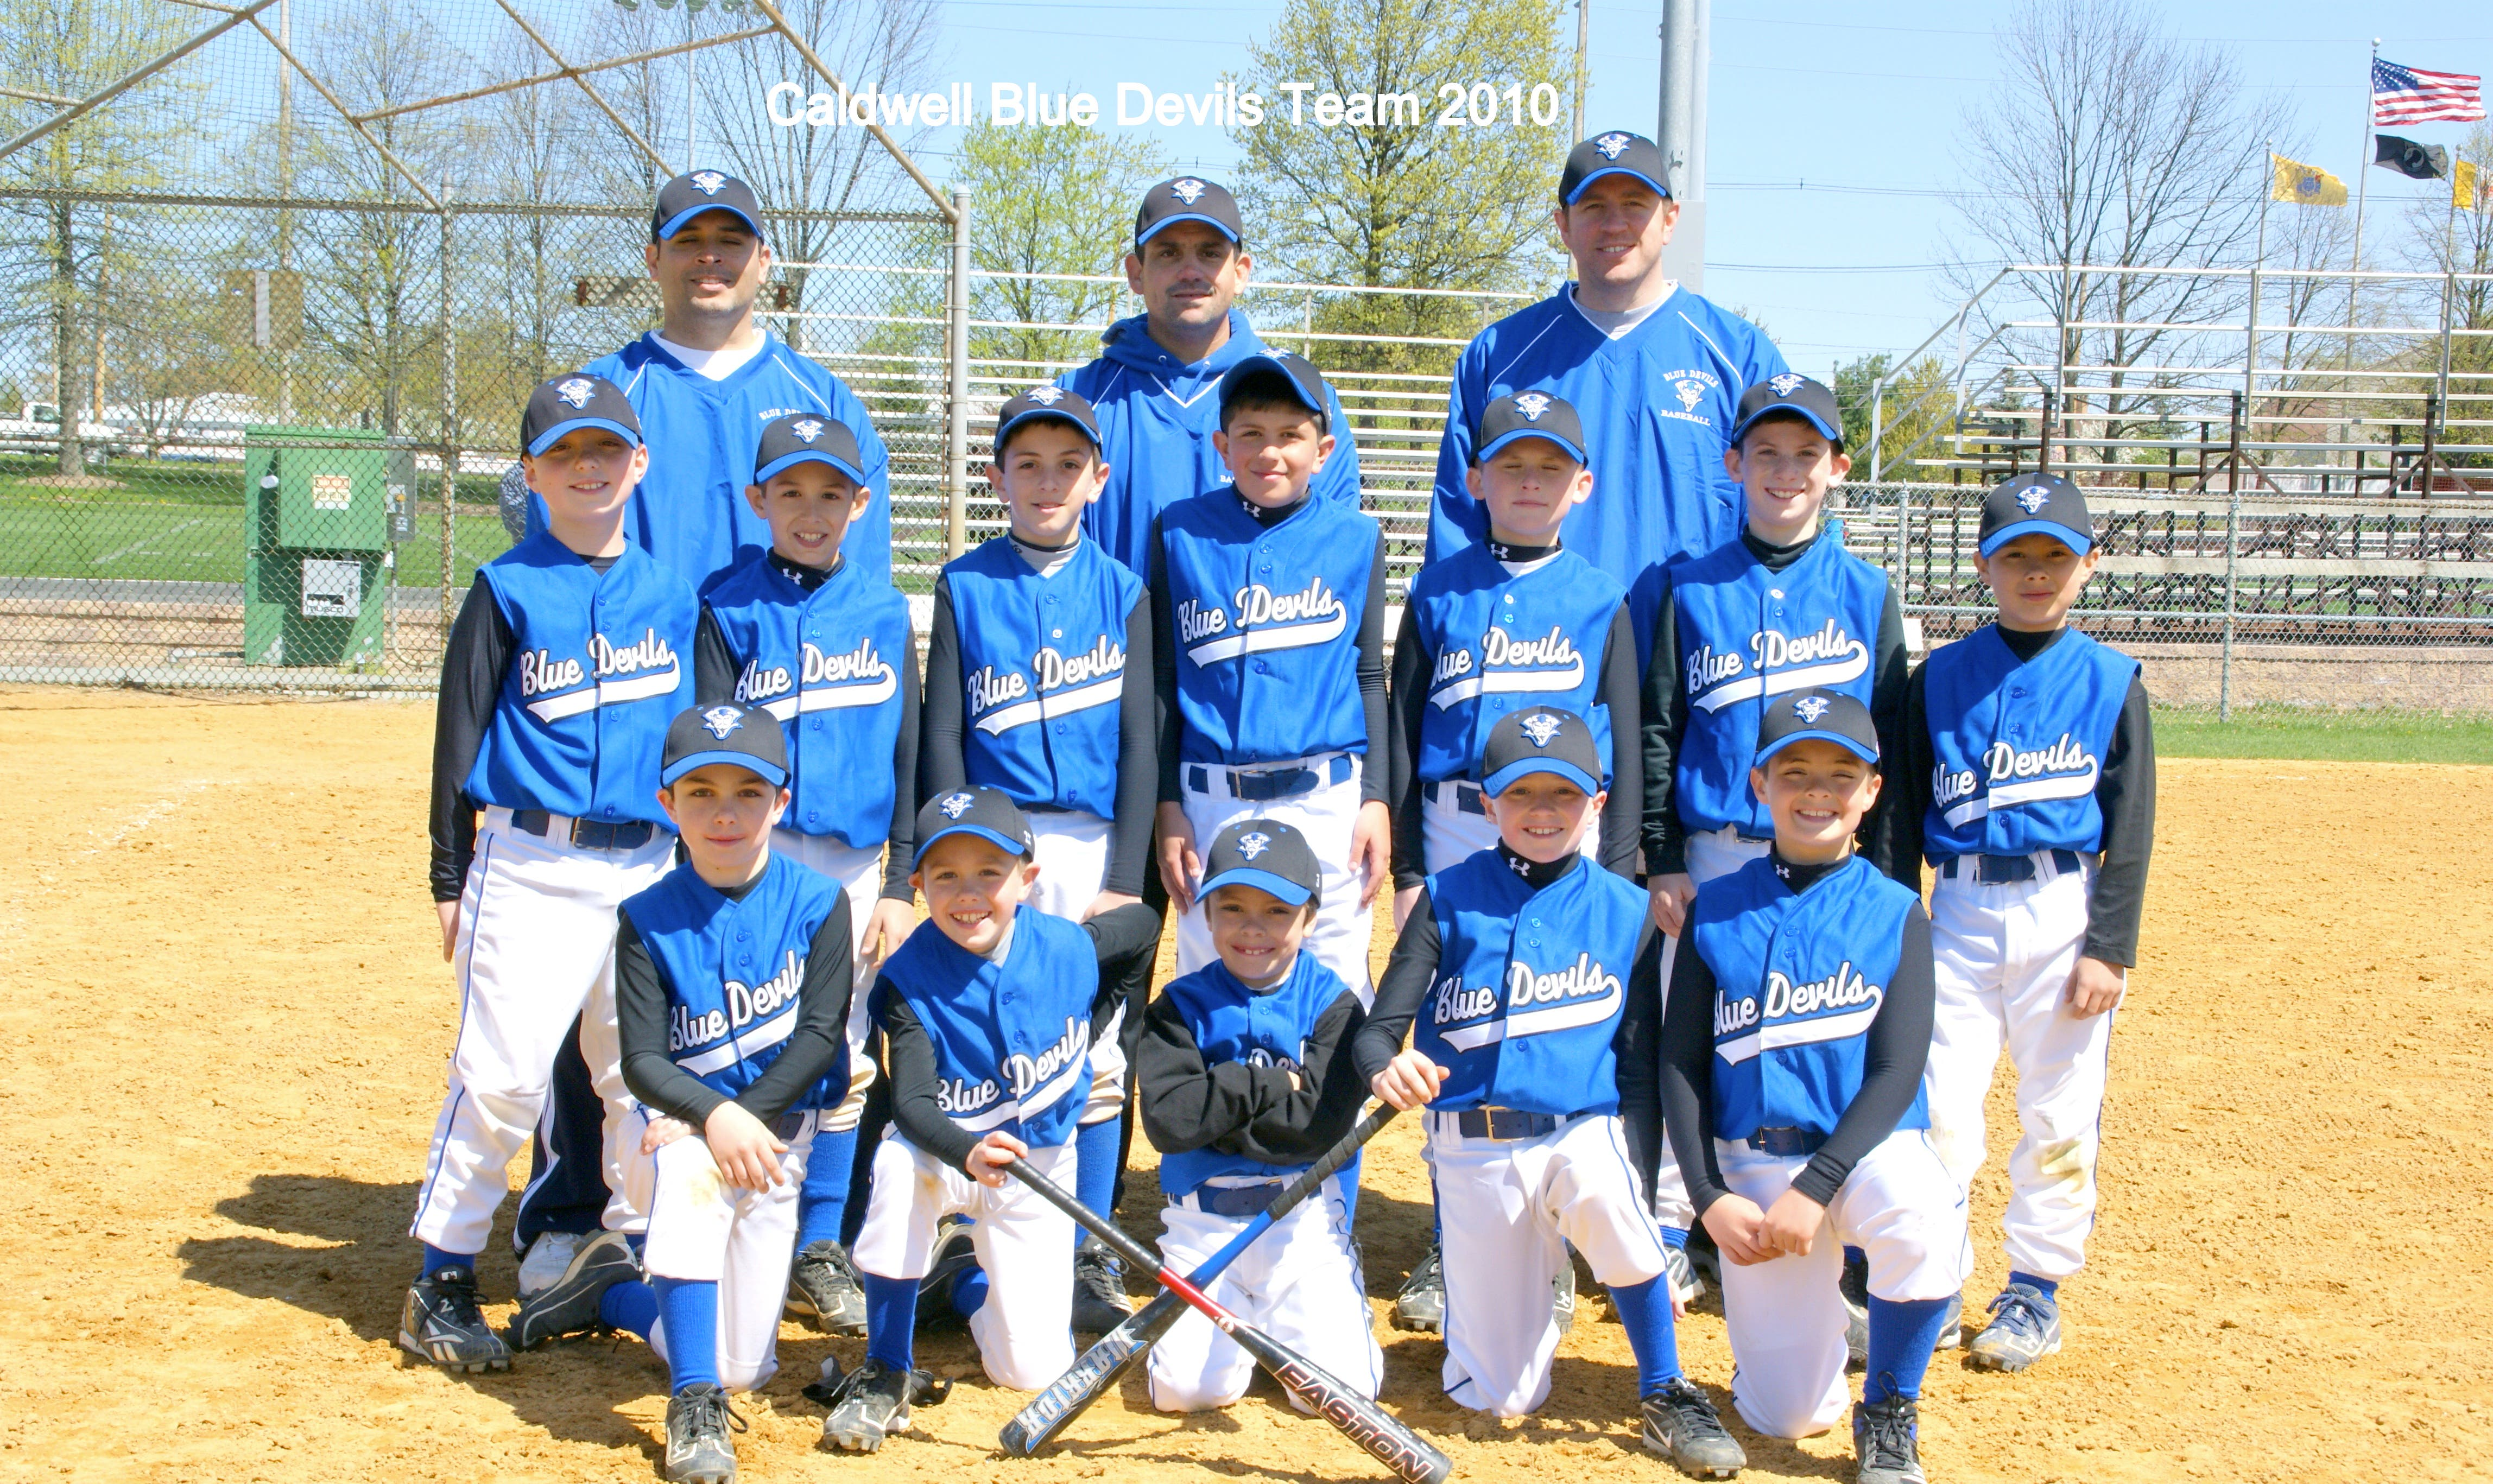 Blue Devils 9U Baseball Team Notches 1st Shutout | Caldwells